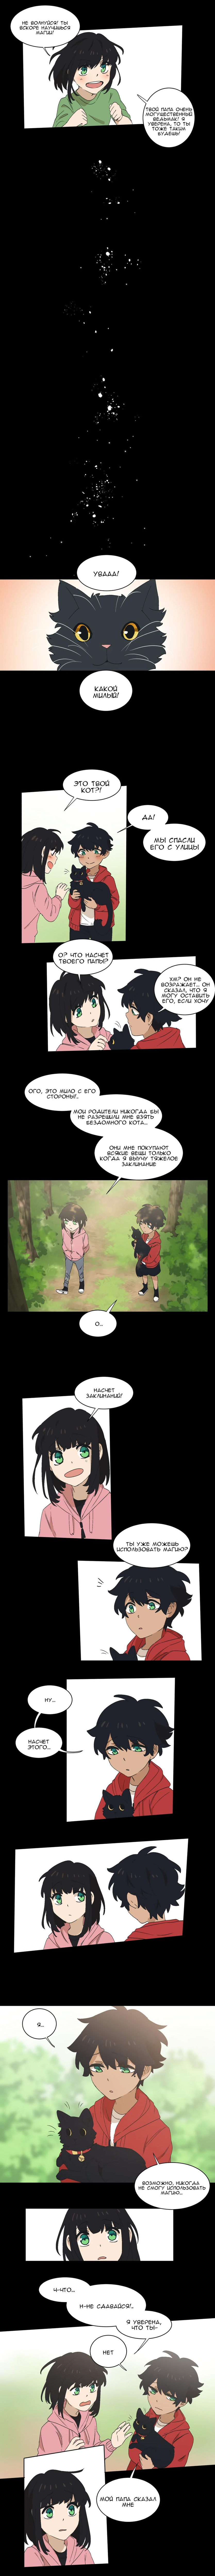 https://r1.ninemanga.com/comics/pic2/38/32806/411998/1524571777681.jpg Page 2